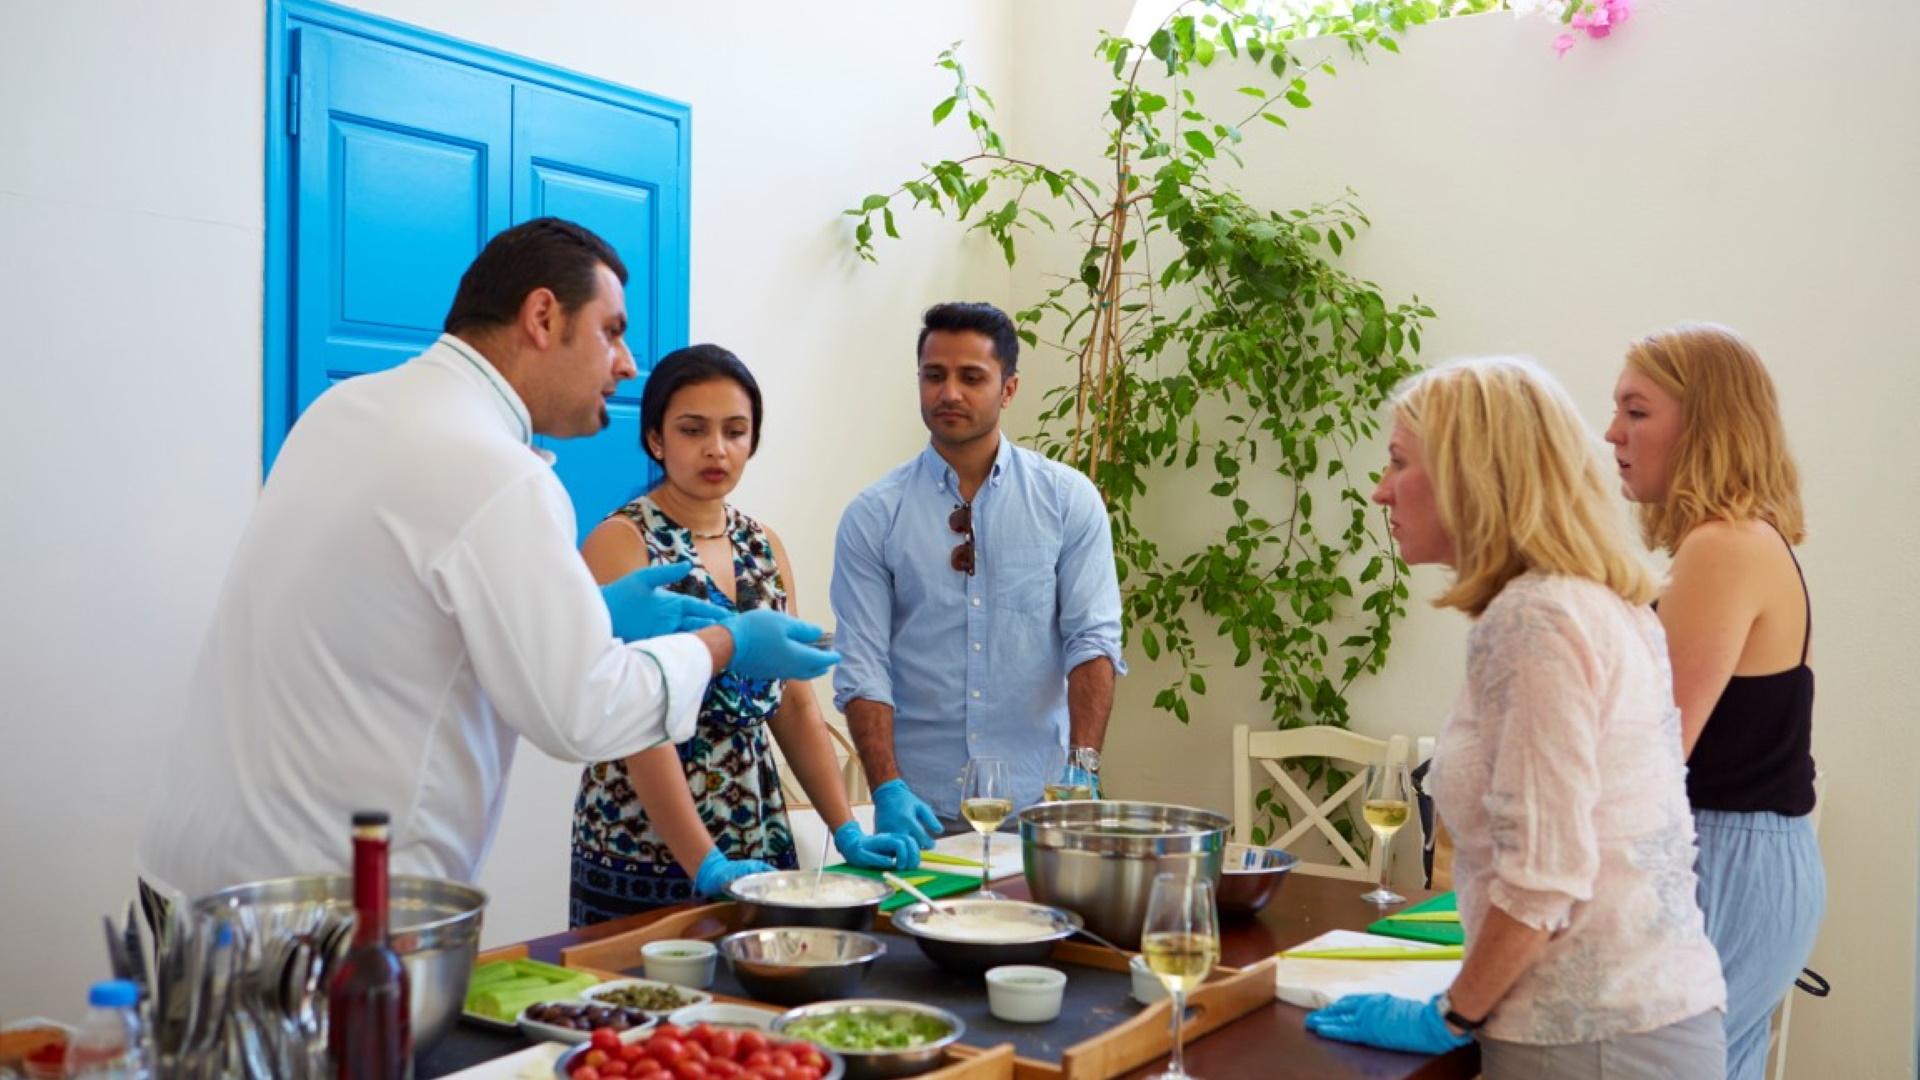 Tours in Santorini - Cooking class and Wine Tasting - Grekaddict